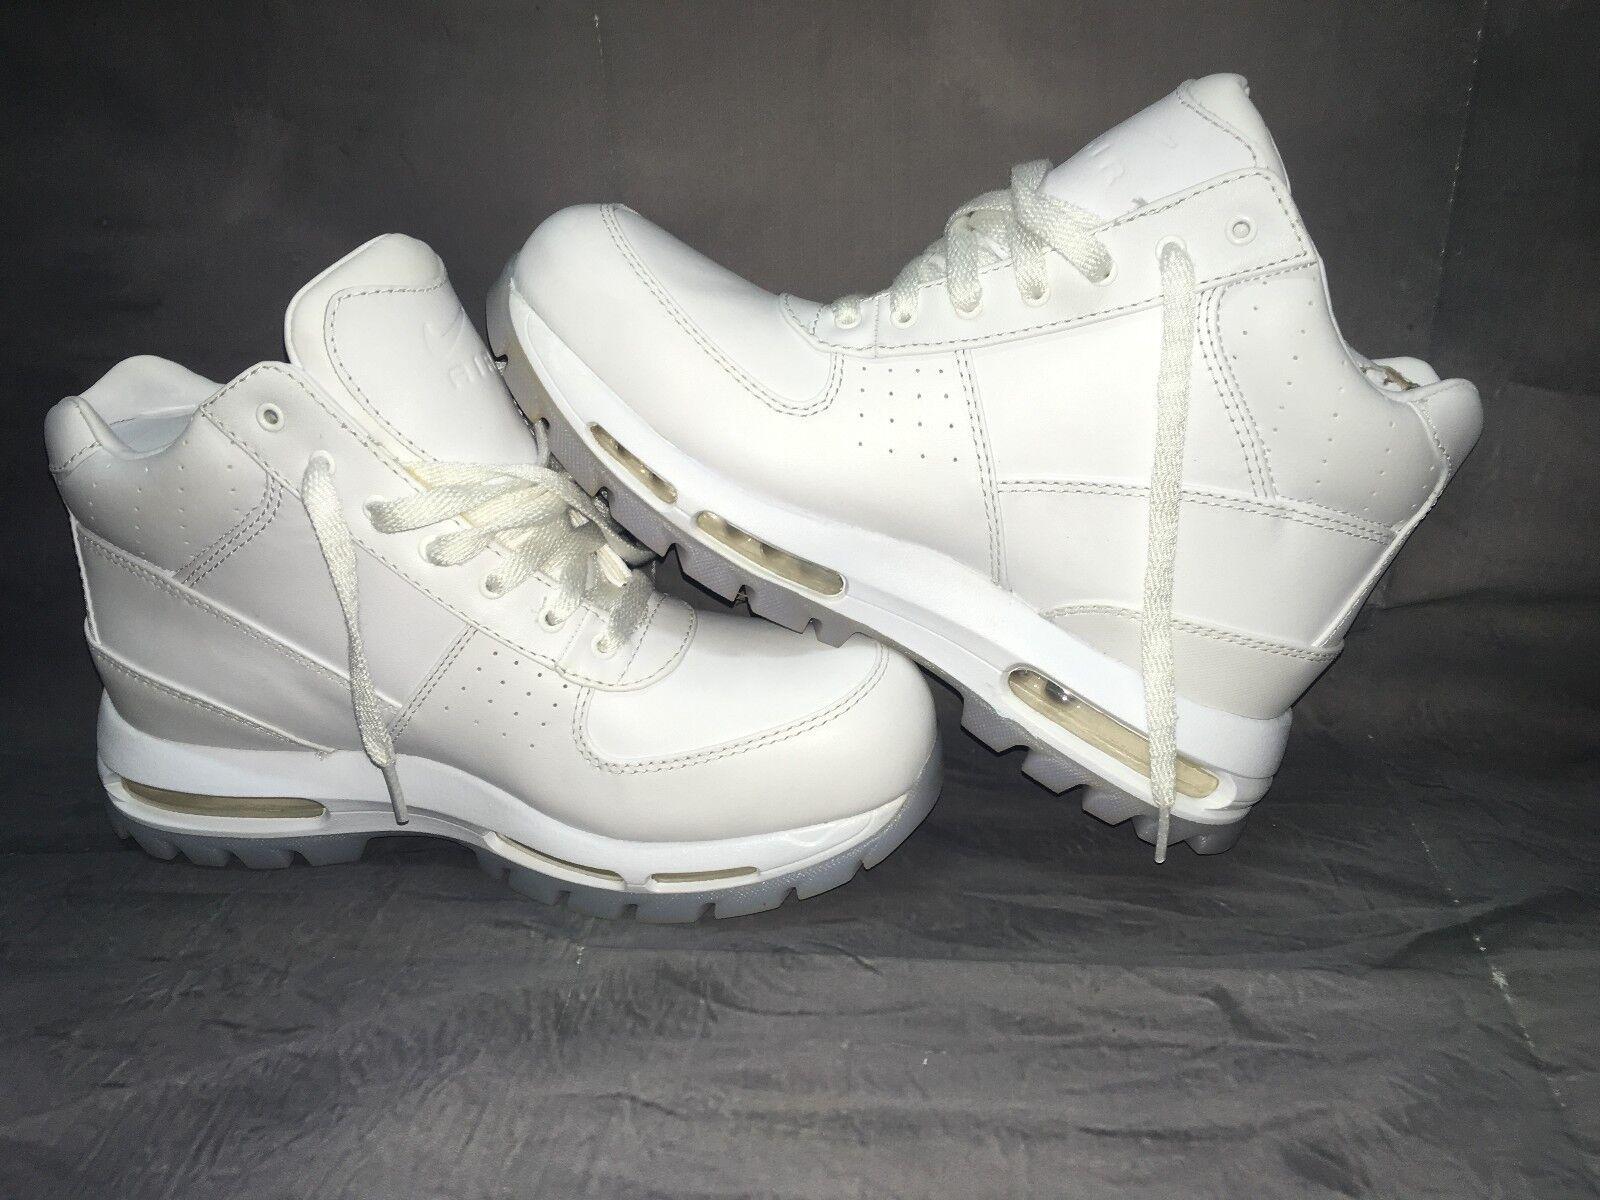 Nike air max acg goadome bianchi, stivali impermeabili acg max (865031-100) uomini. da34cd